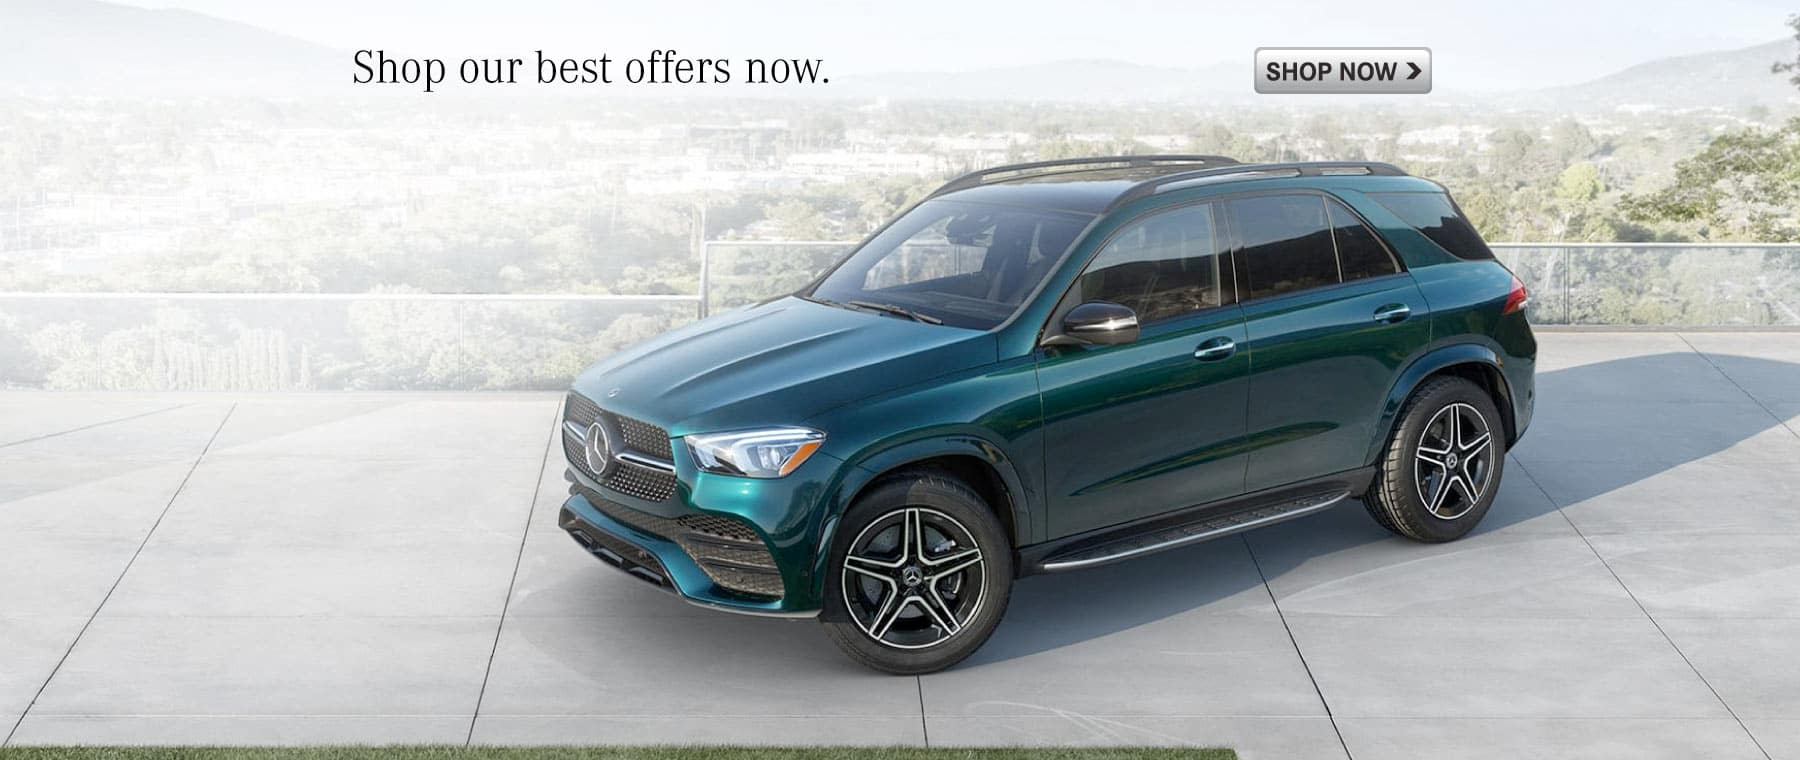 Mercedes-Benz of Los Angeles | Mercedes-Benz Dealer in Los ...